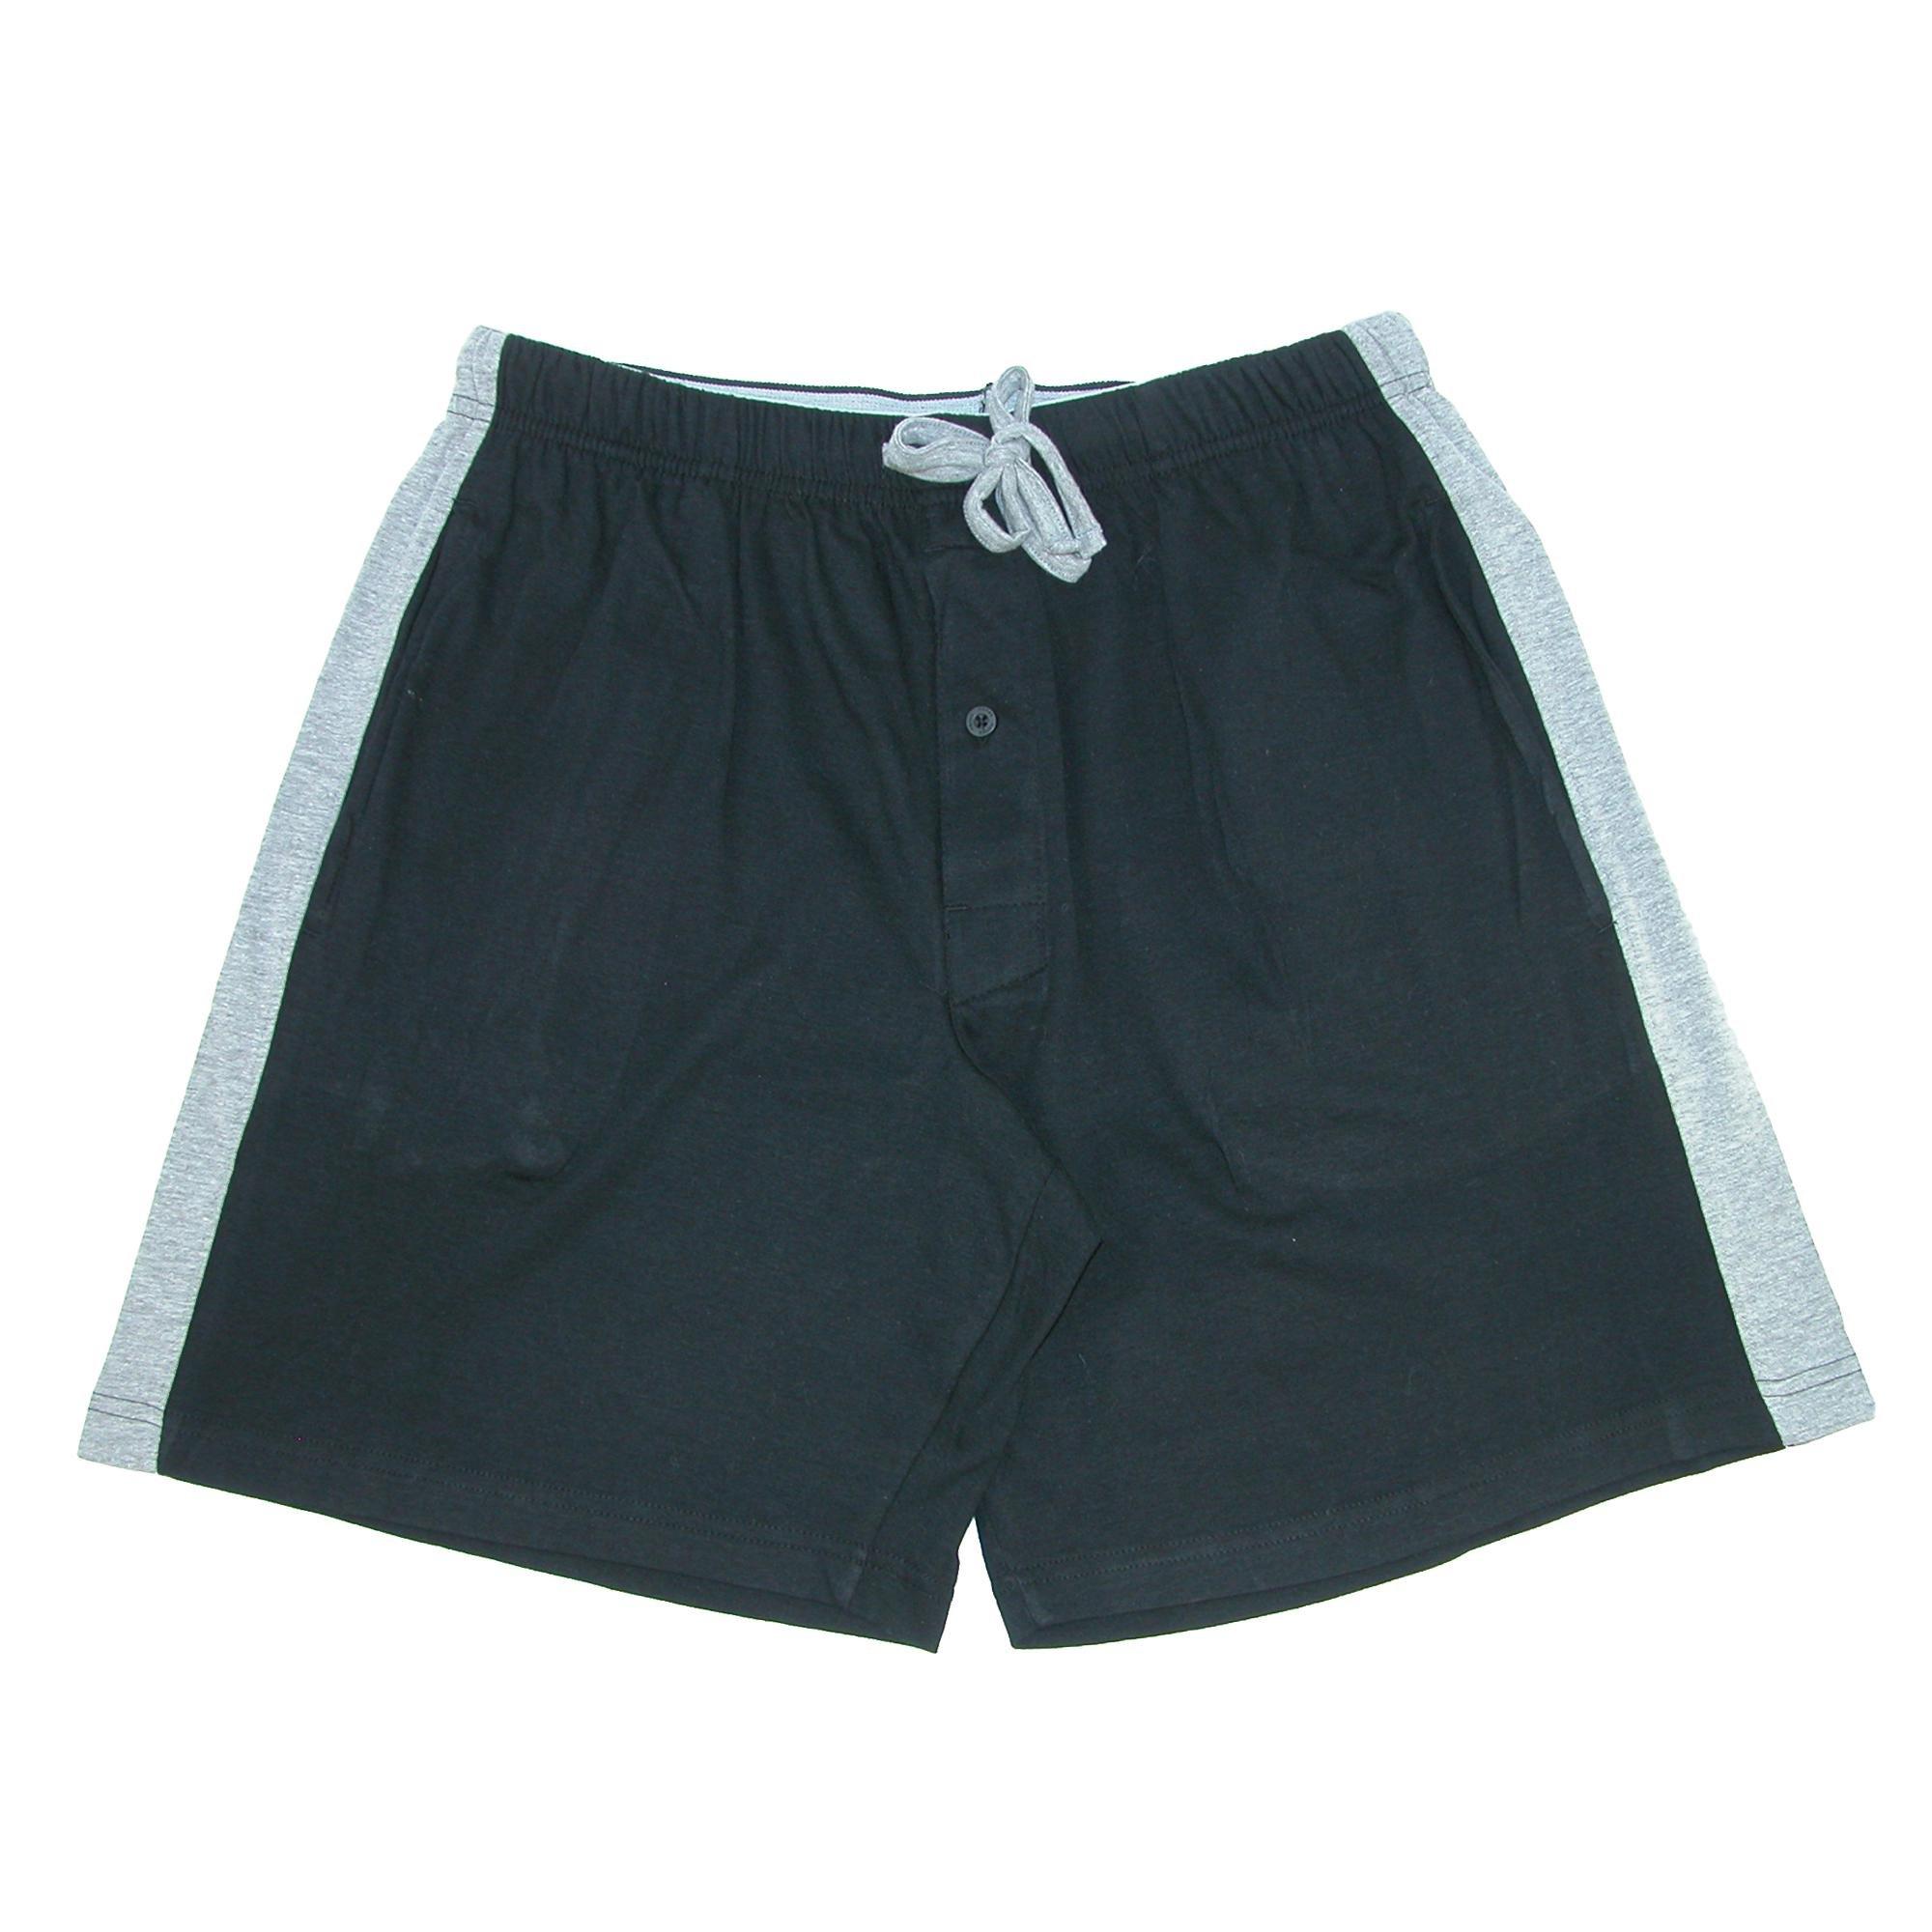 Hanes Men's Knit Pajama Sleep Short with Side Stripe, 2XL, Black